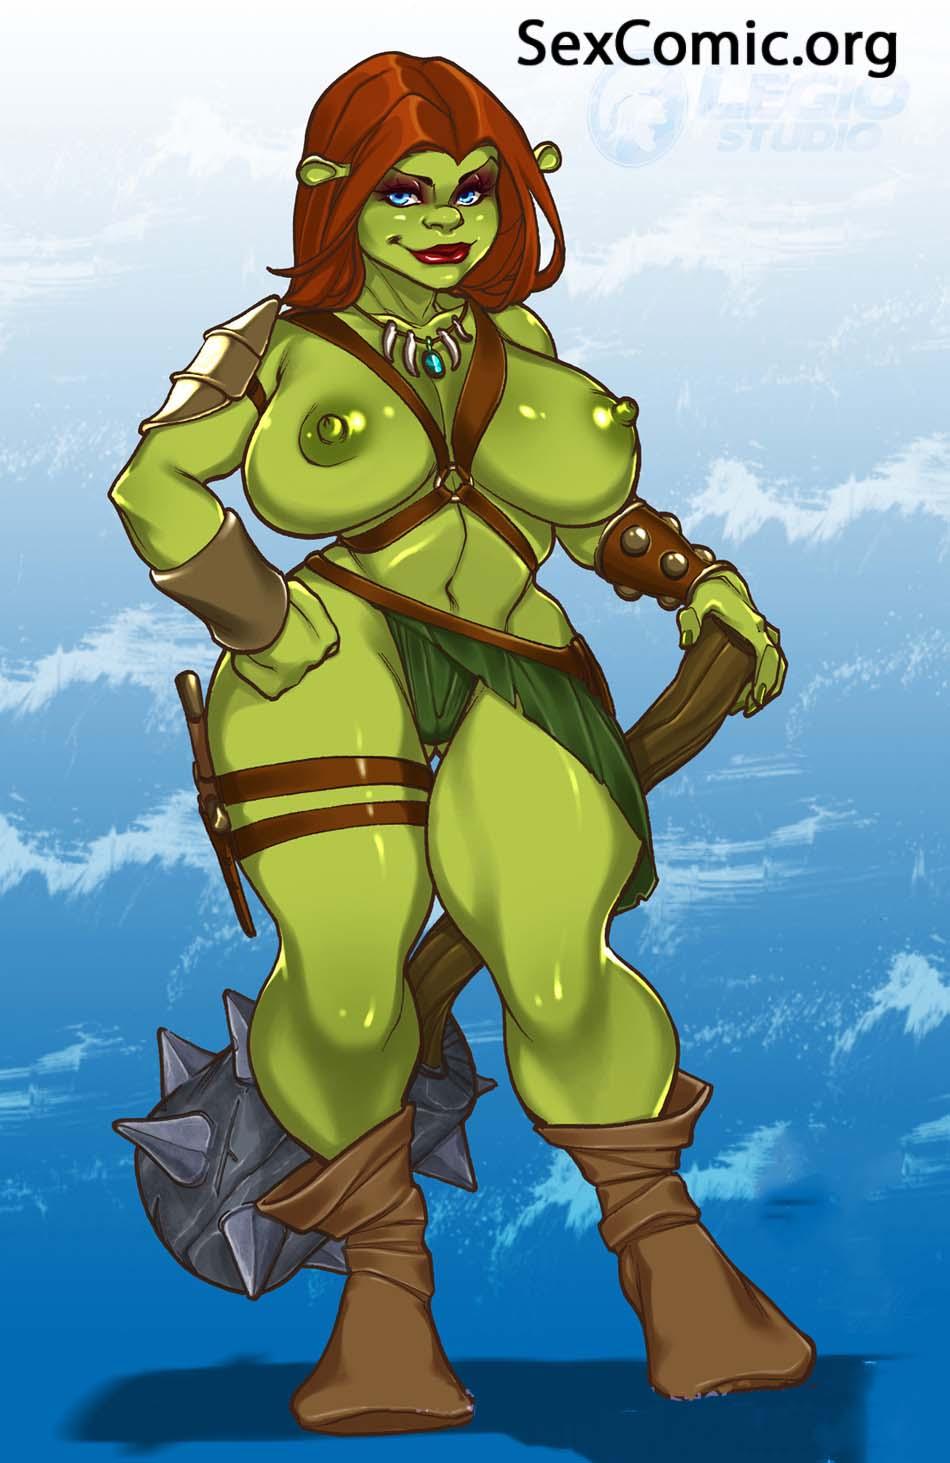 Shrek Cartoon porno photos Nakad gril